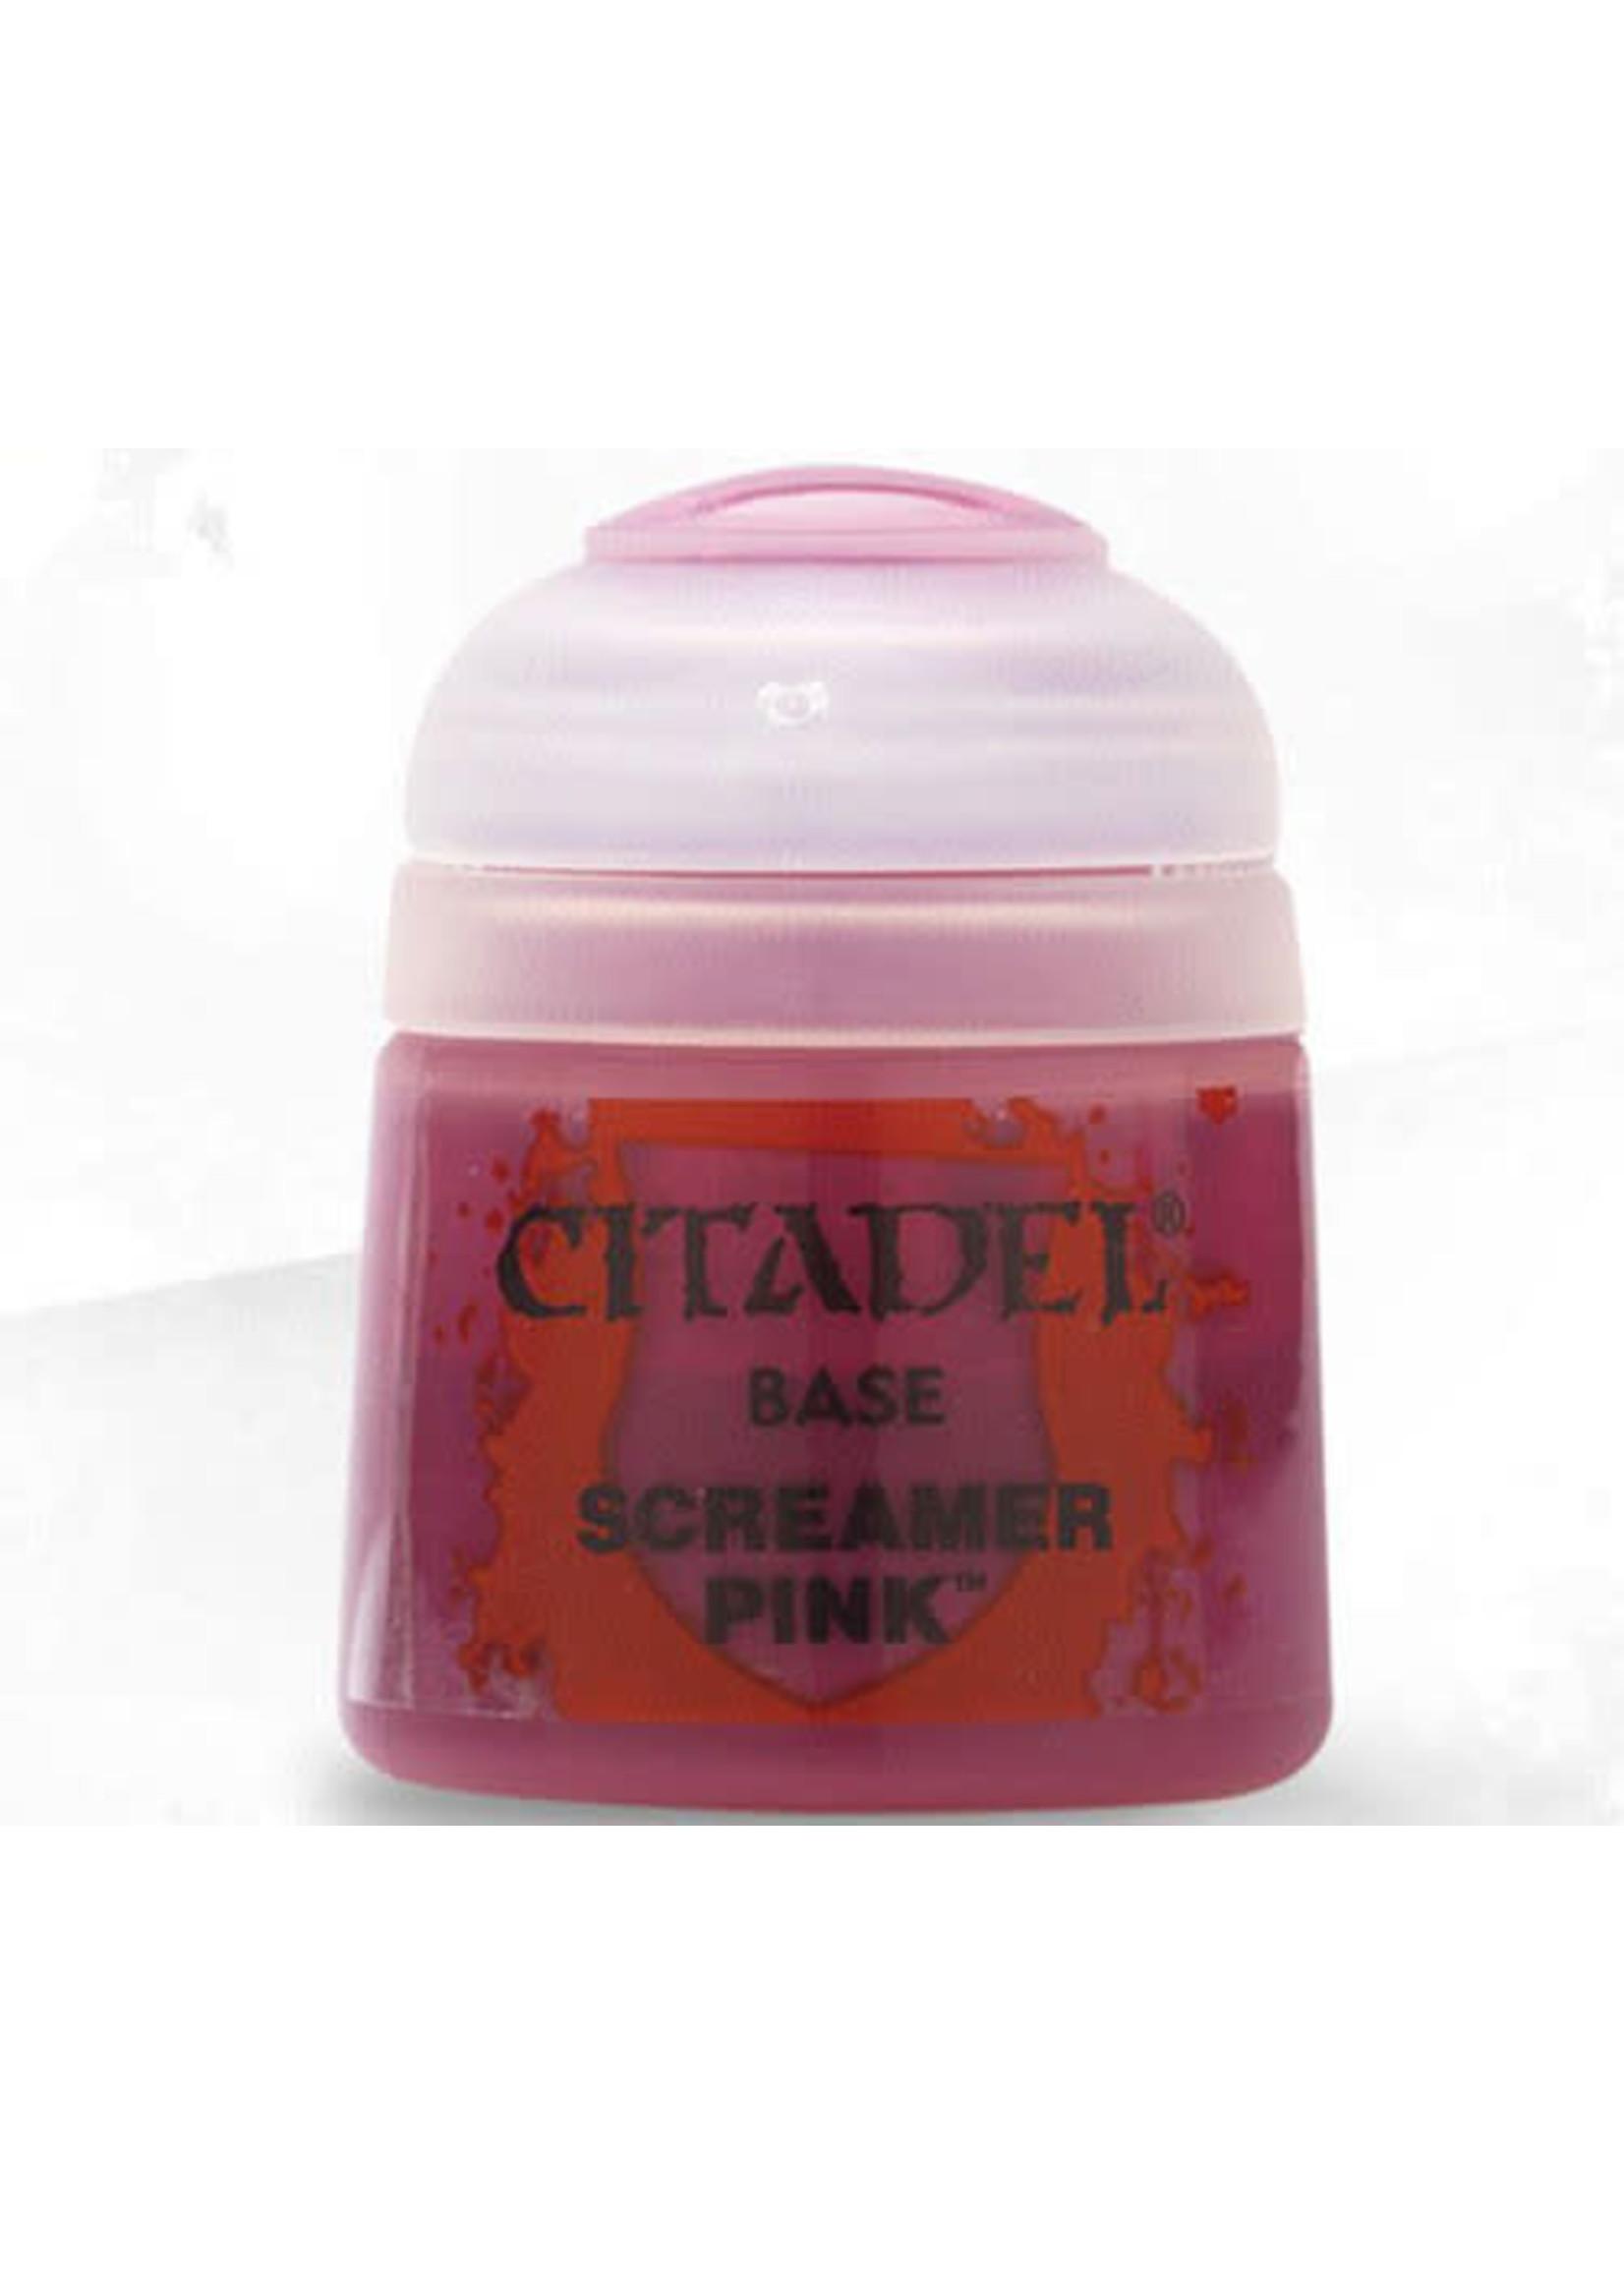 Games Workshop Citadel Paint: Screamer Pink 12ml